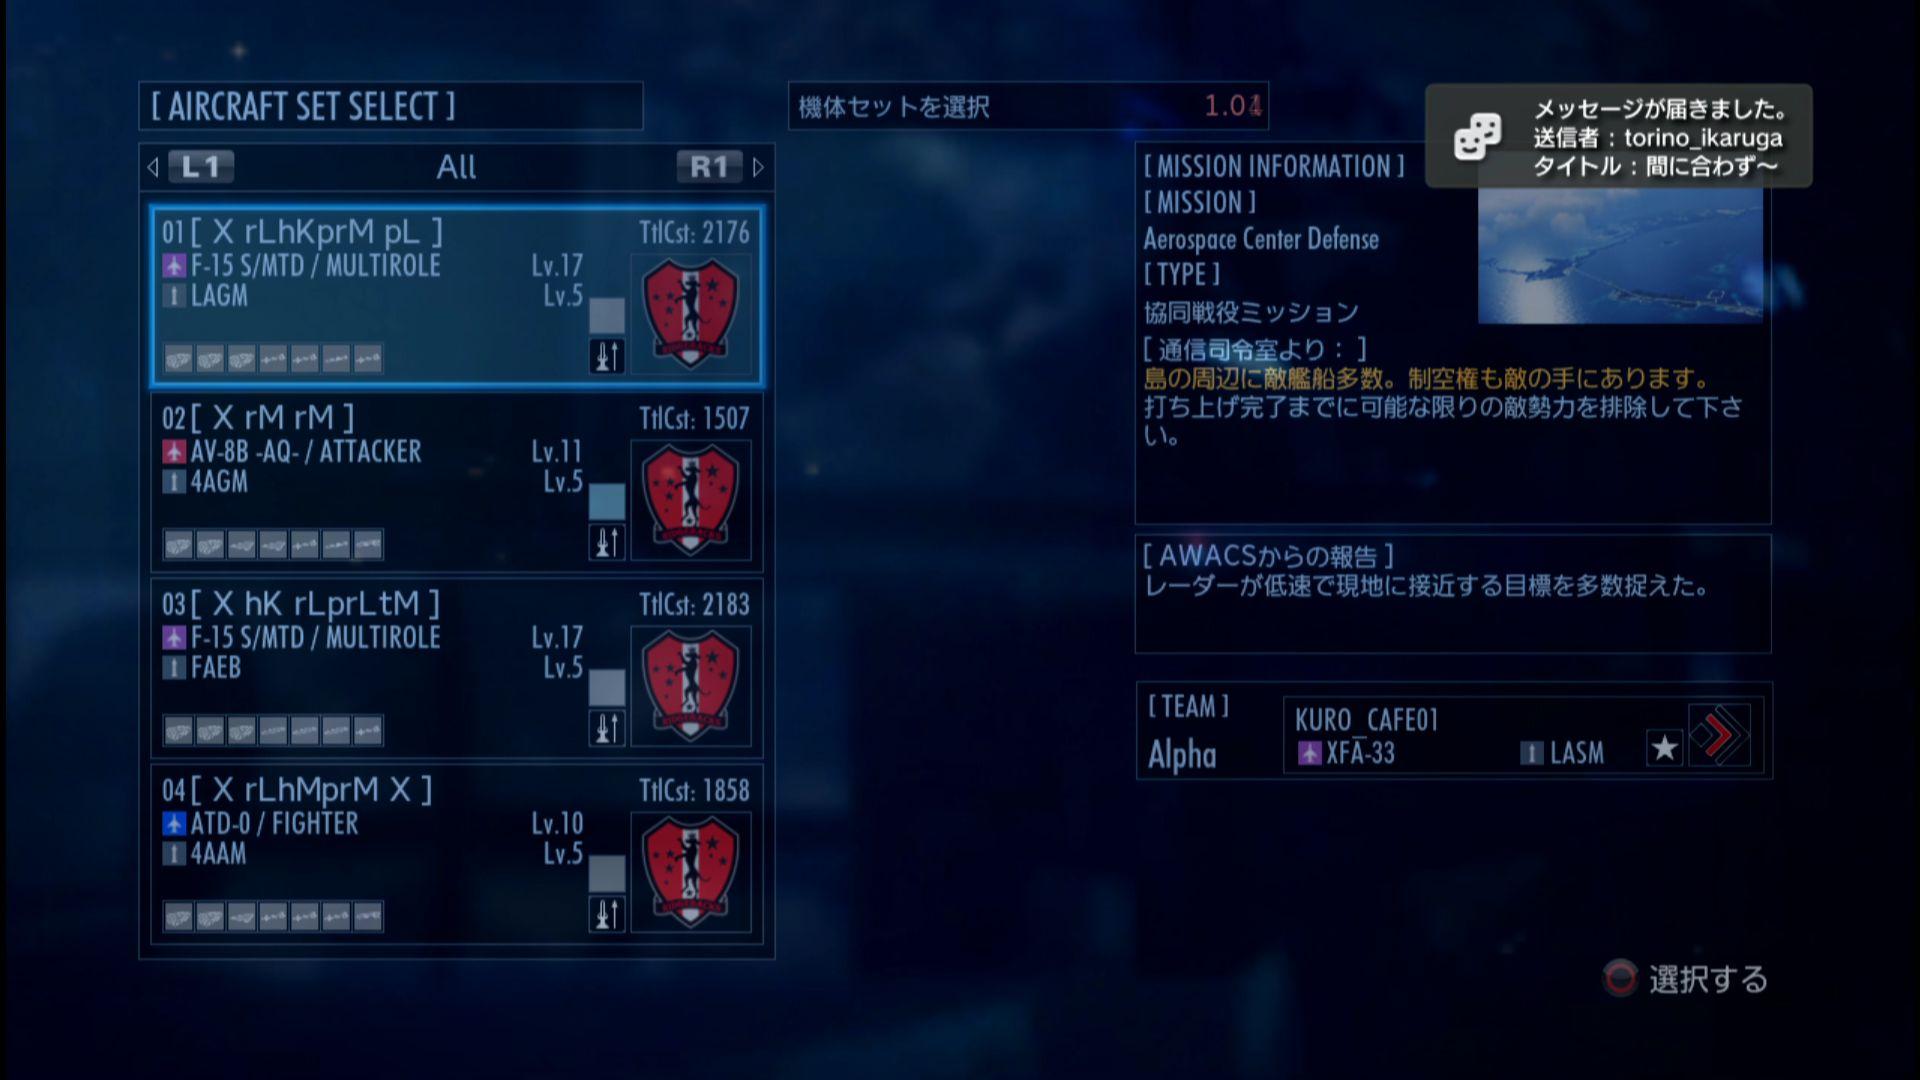 2015_11_6_1_33_21